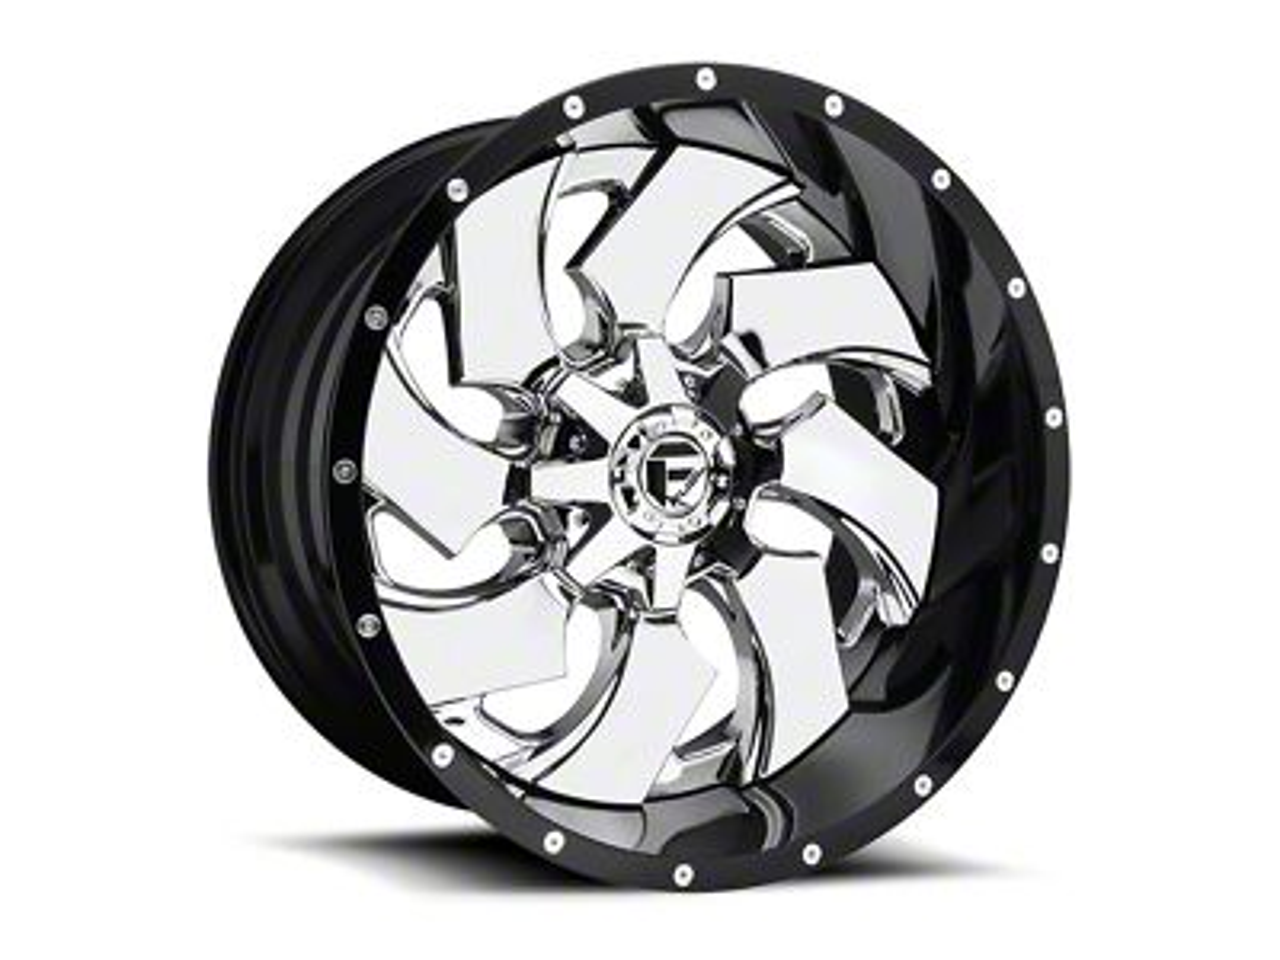 Fuel Wheels Cleaver Chrome 6-Lug Wheel - 24x14 (04-18 F-150)